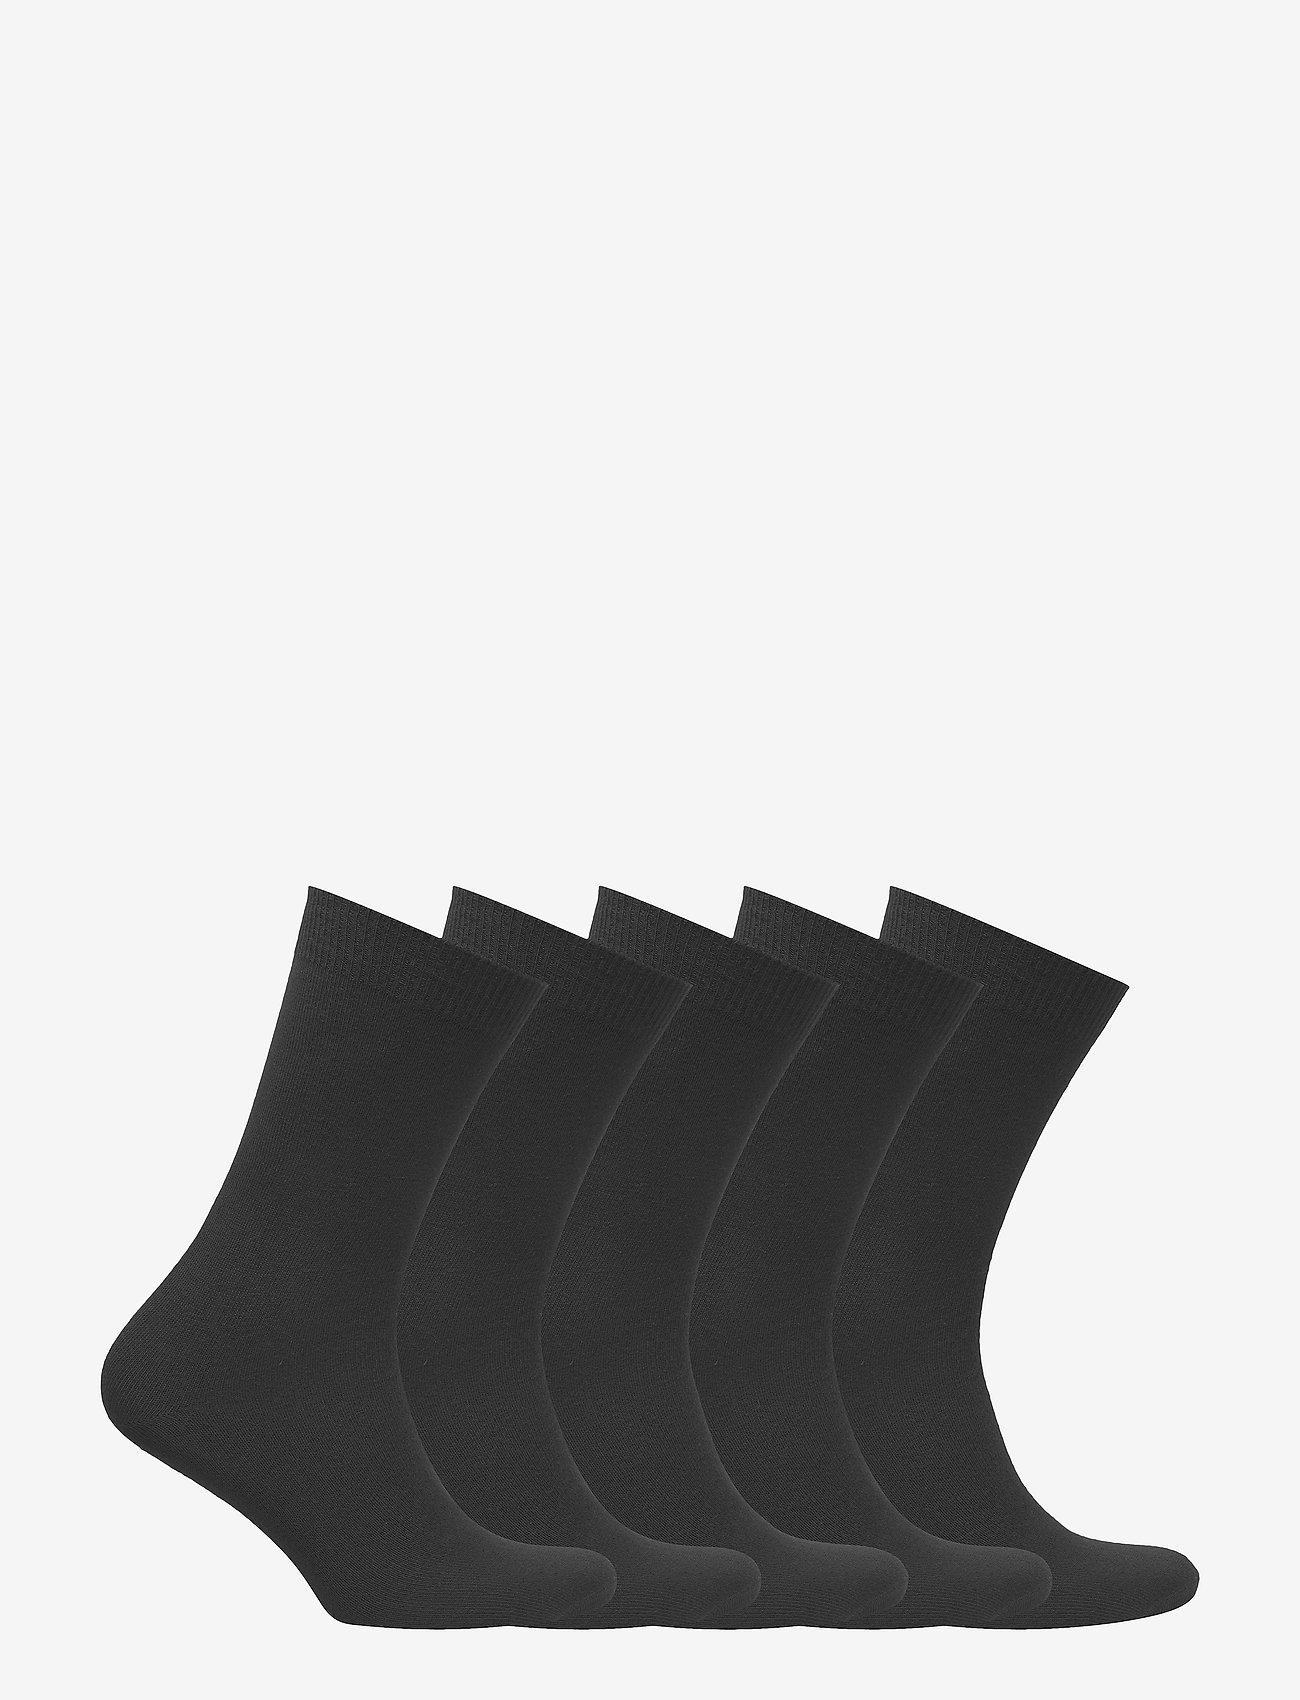 Decoy - DECOY ankle sock cotton 5-pk - socks - black